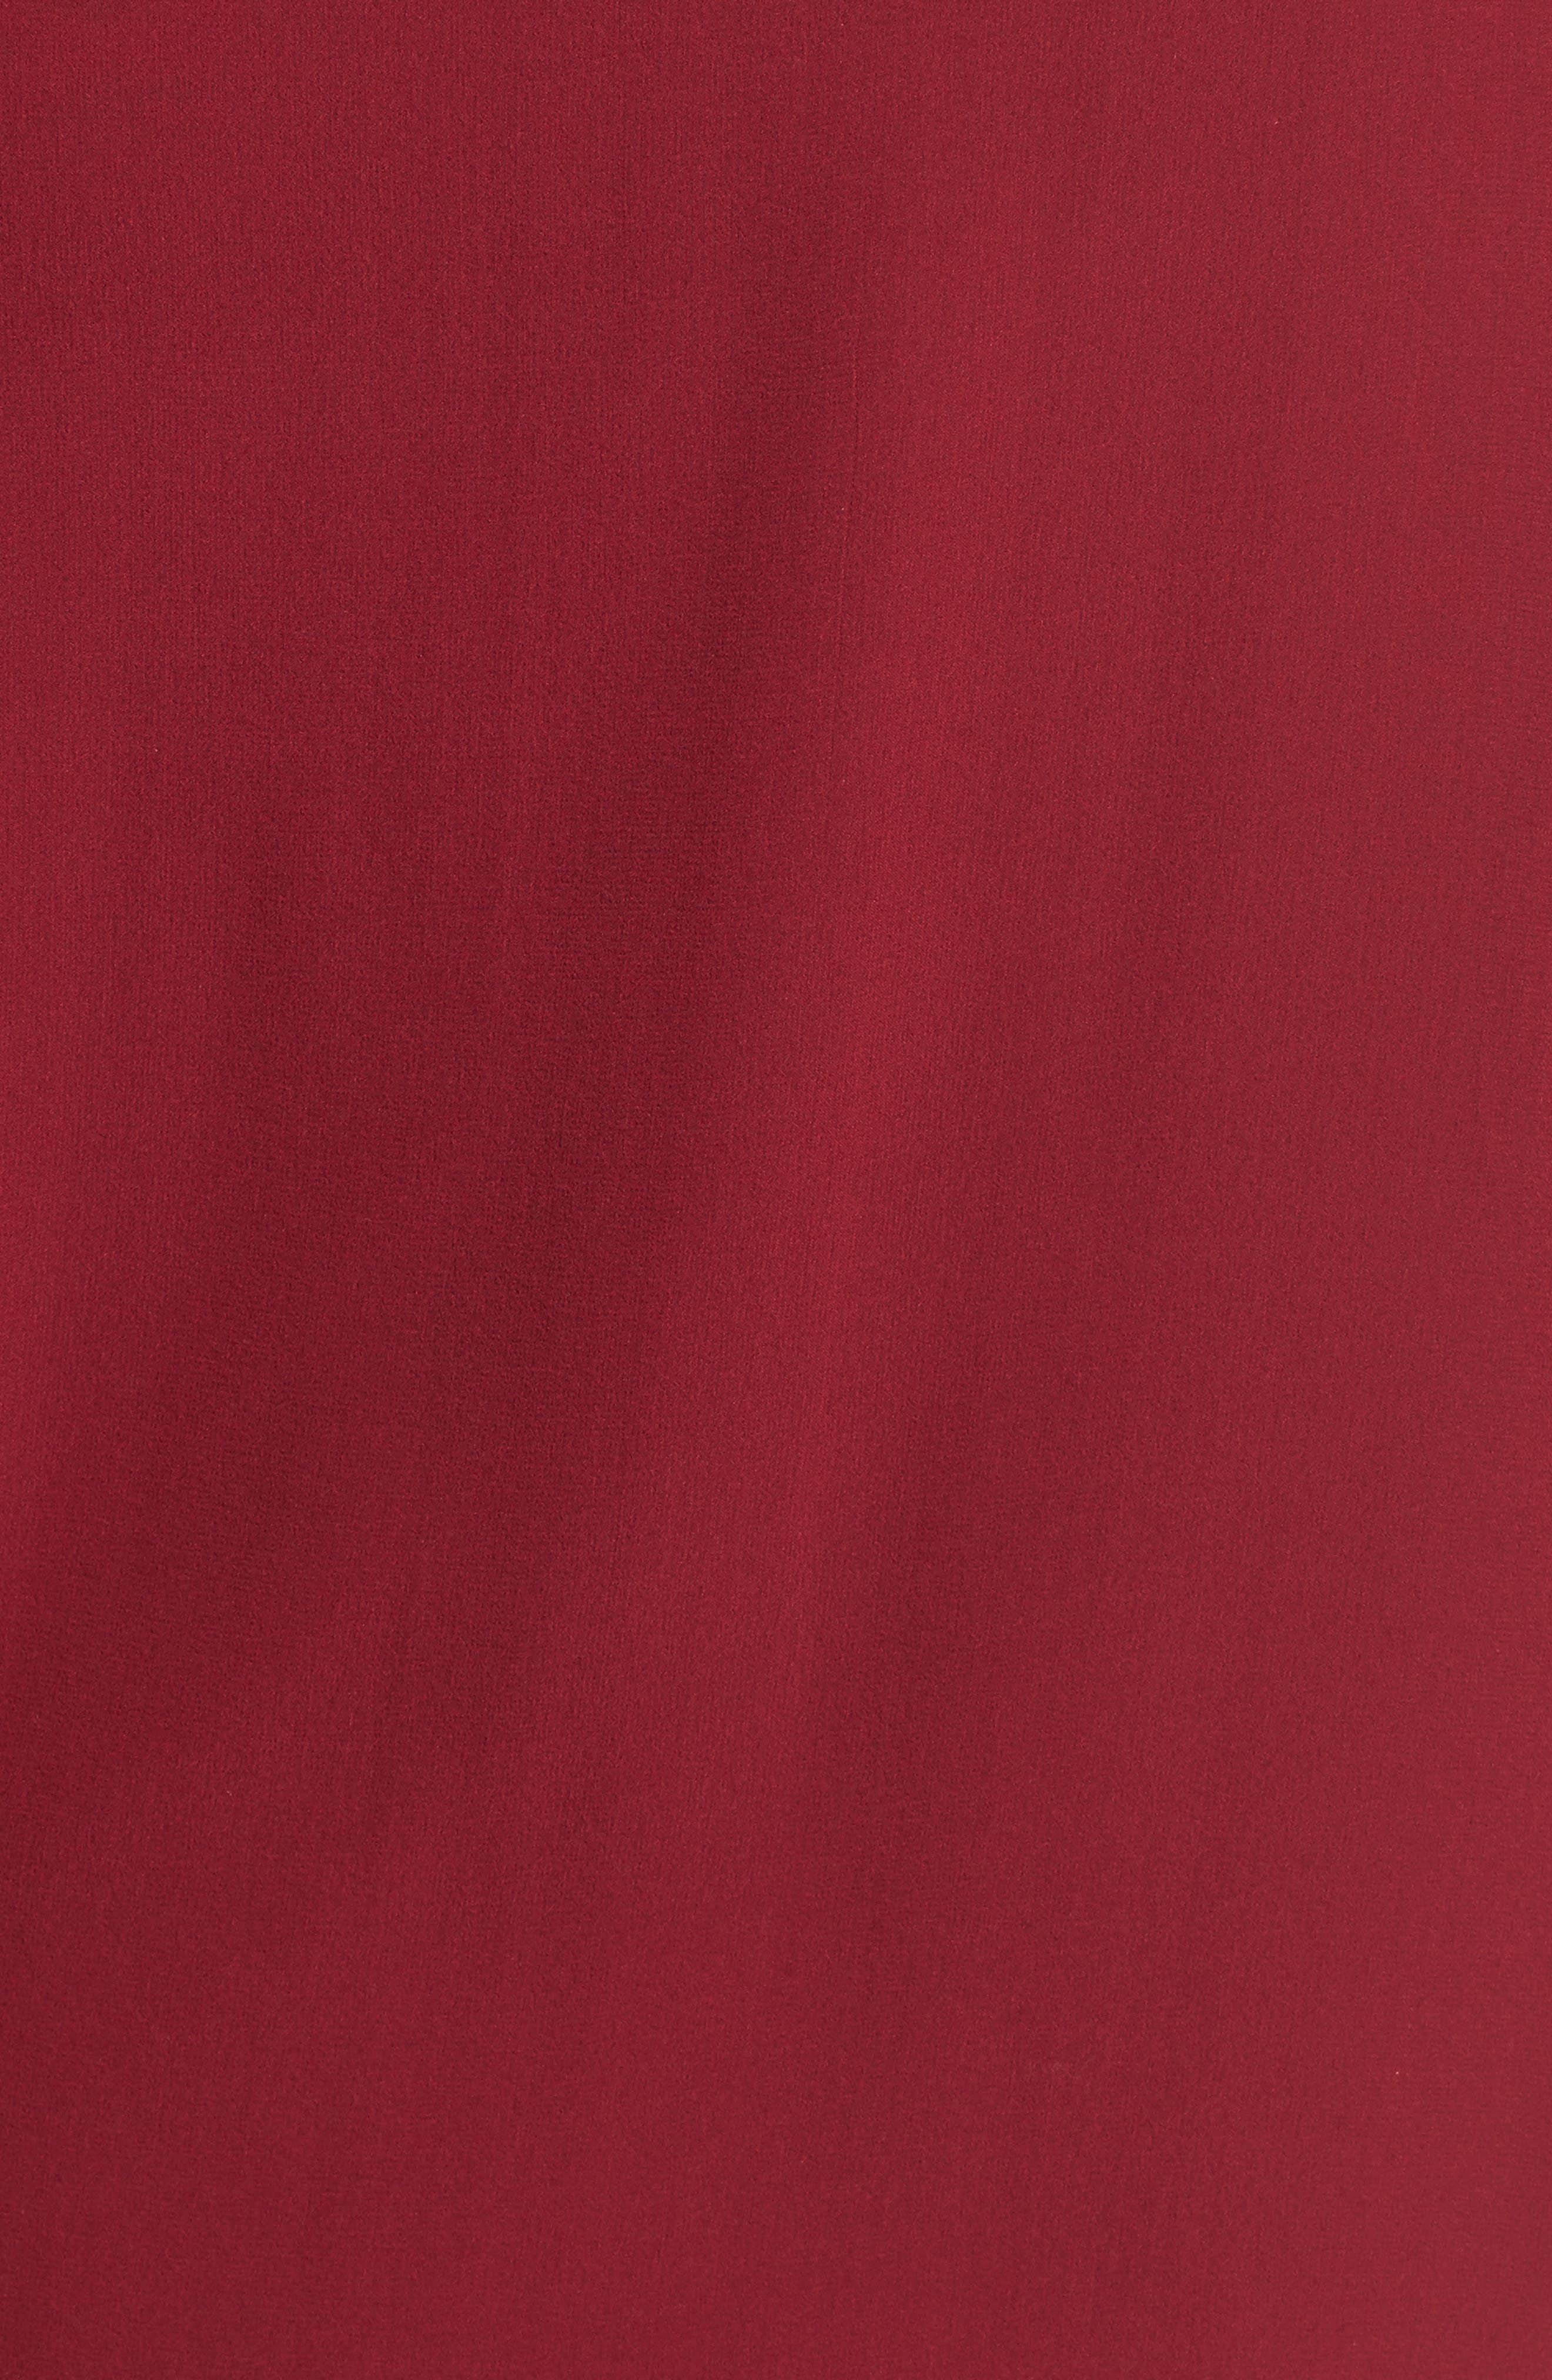 Bateau Neck Silk Boxy Top,                             Alternate thumbnail 5, color,                             Hibiscus